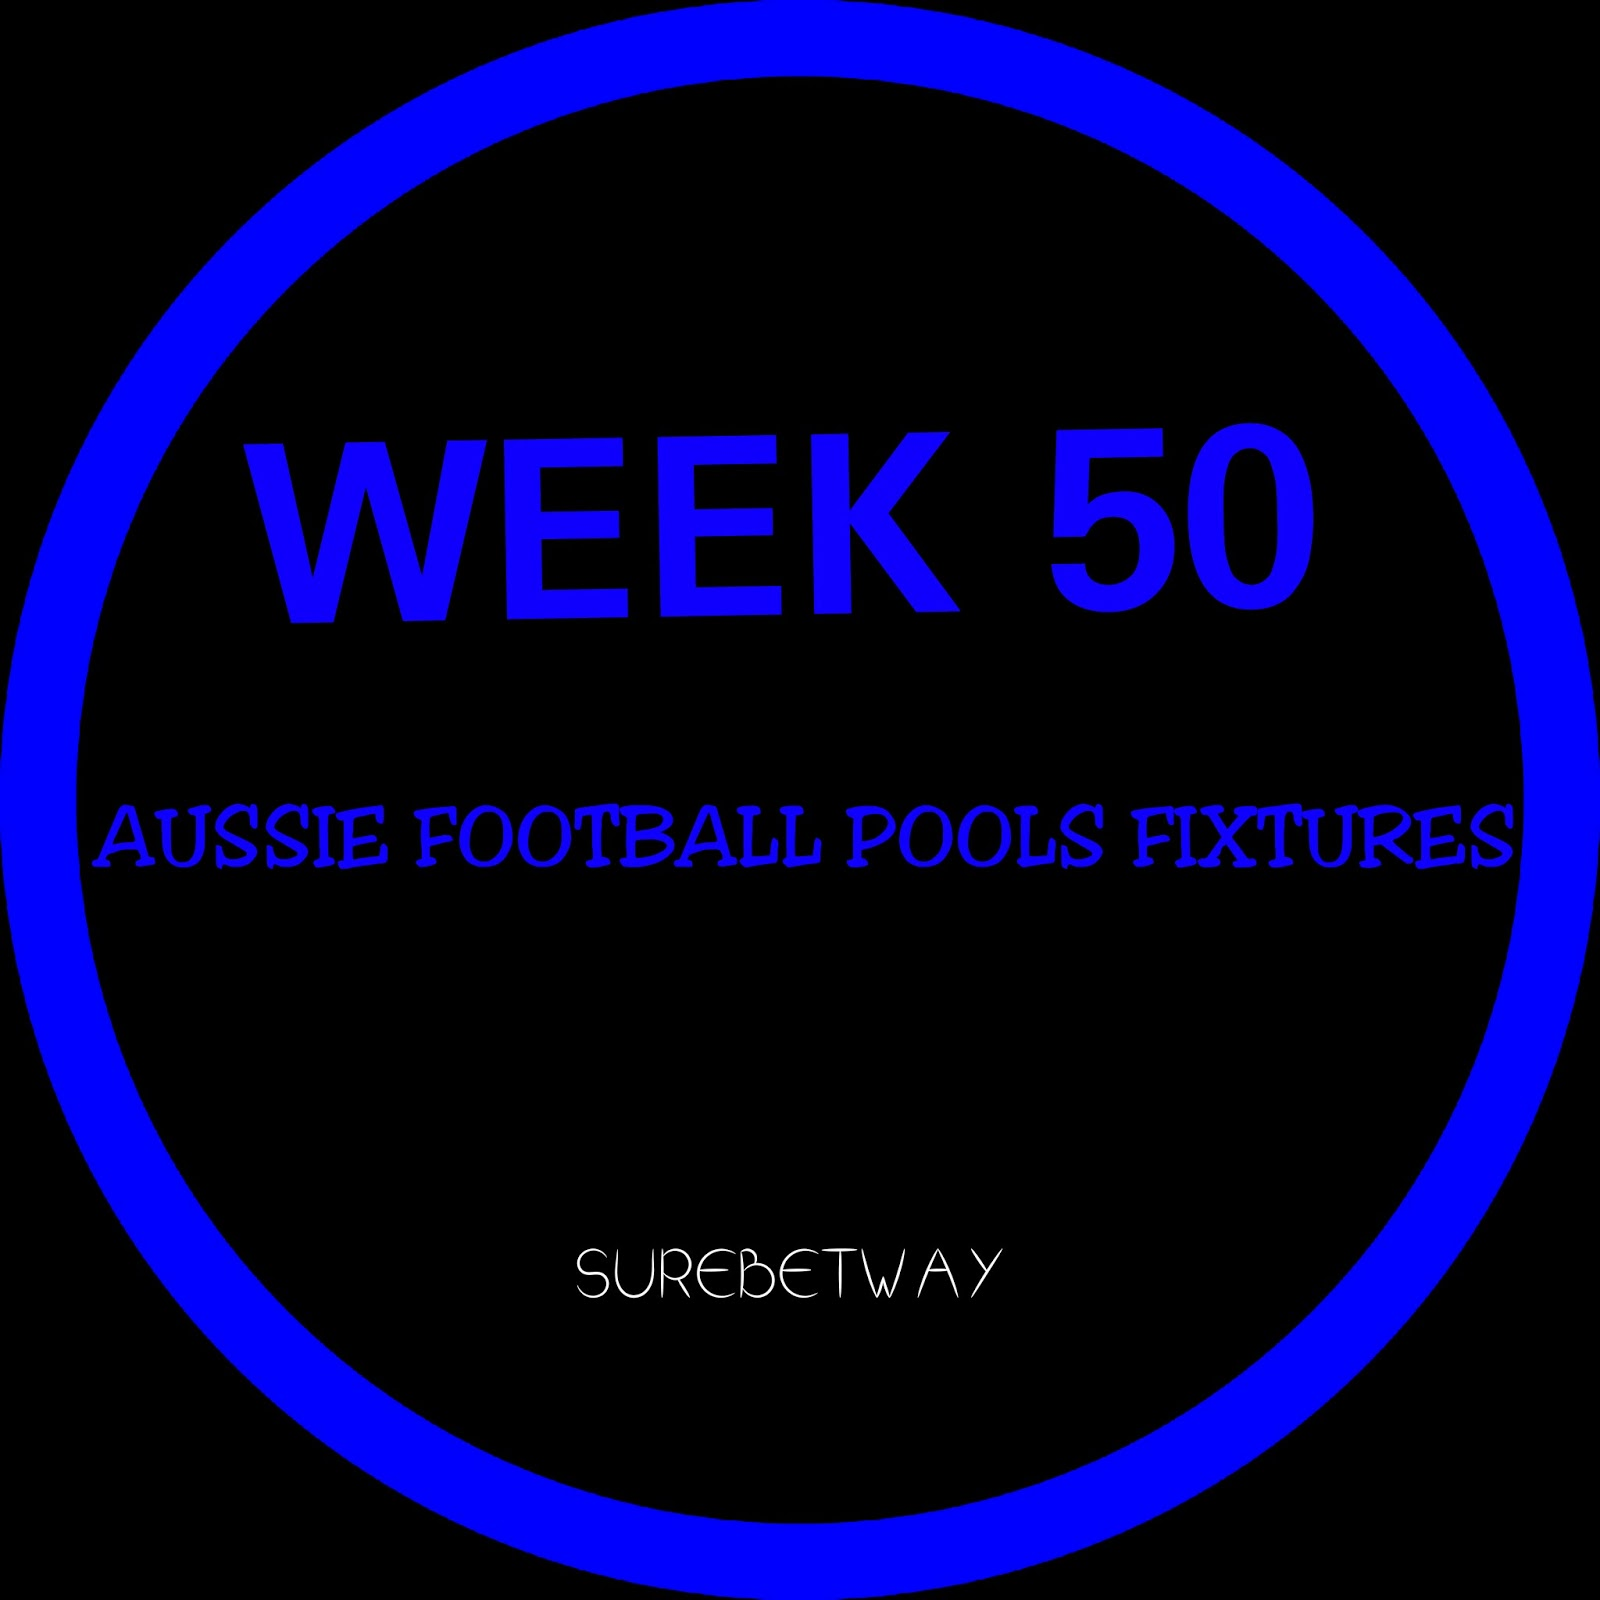 WEEK 50: AUSSIE ADVANCE FOOTBALL POOLS FIXTURES